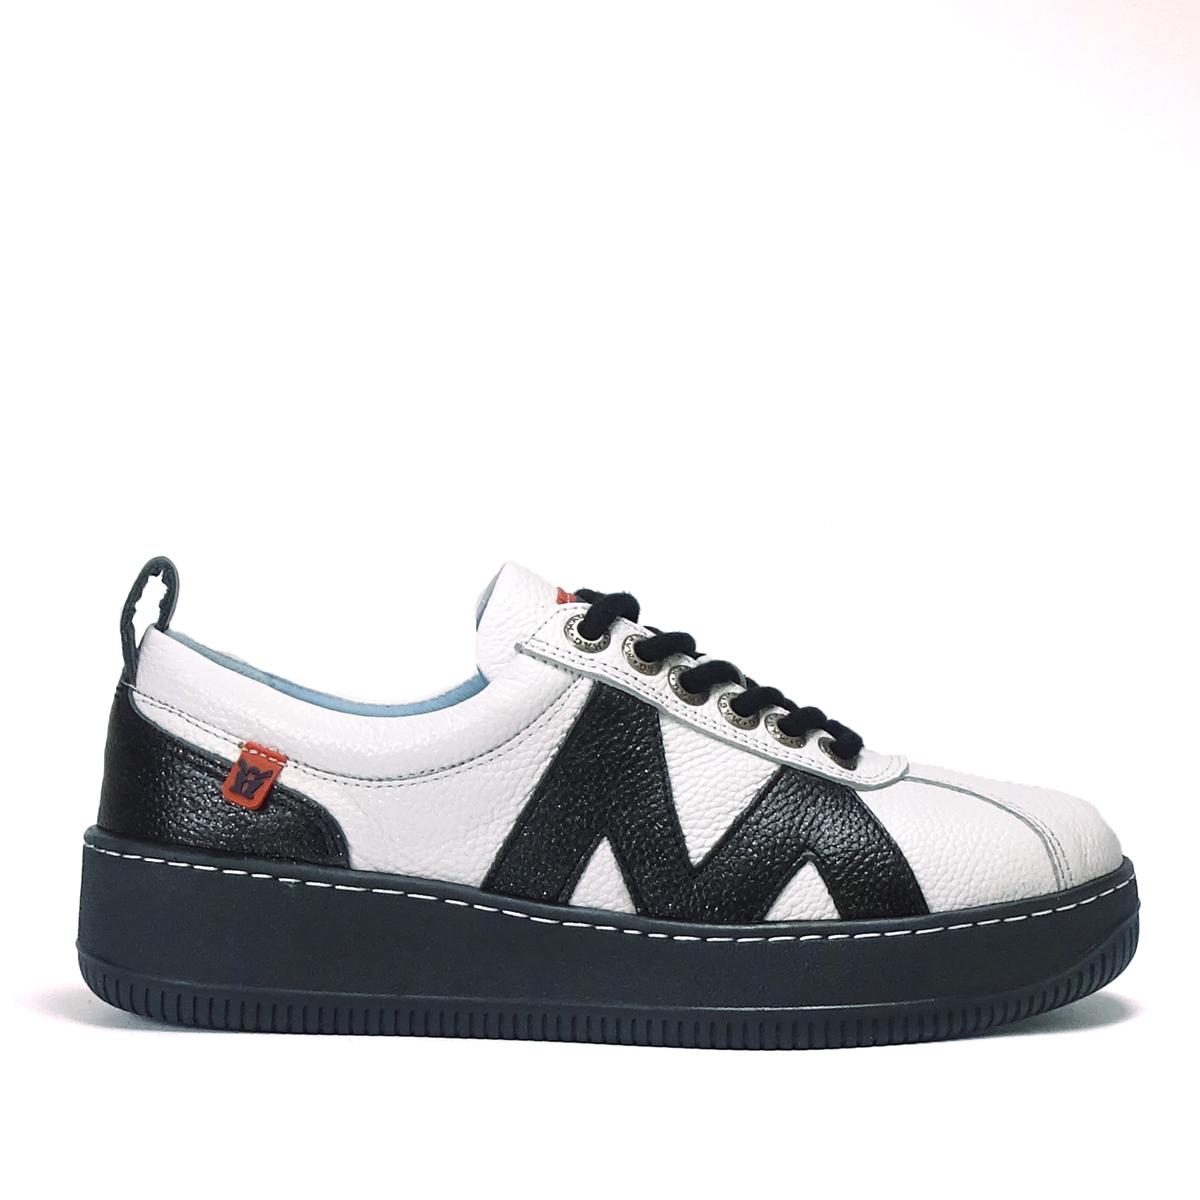 Sympasneaker 4213 White Pearl